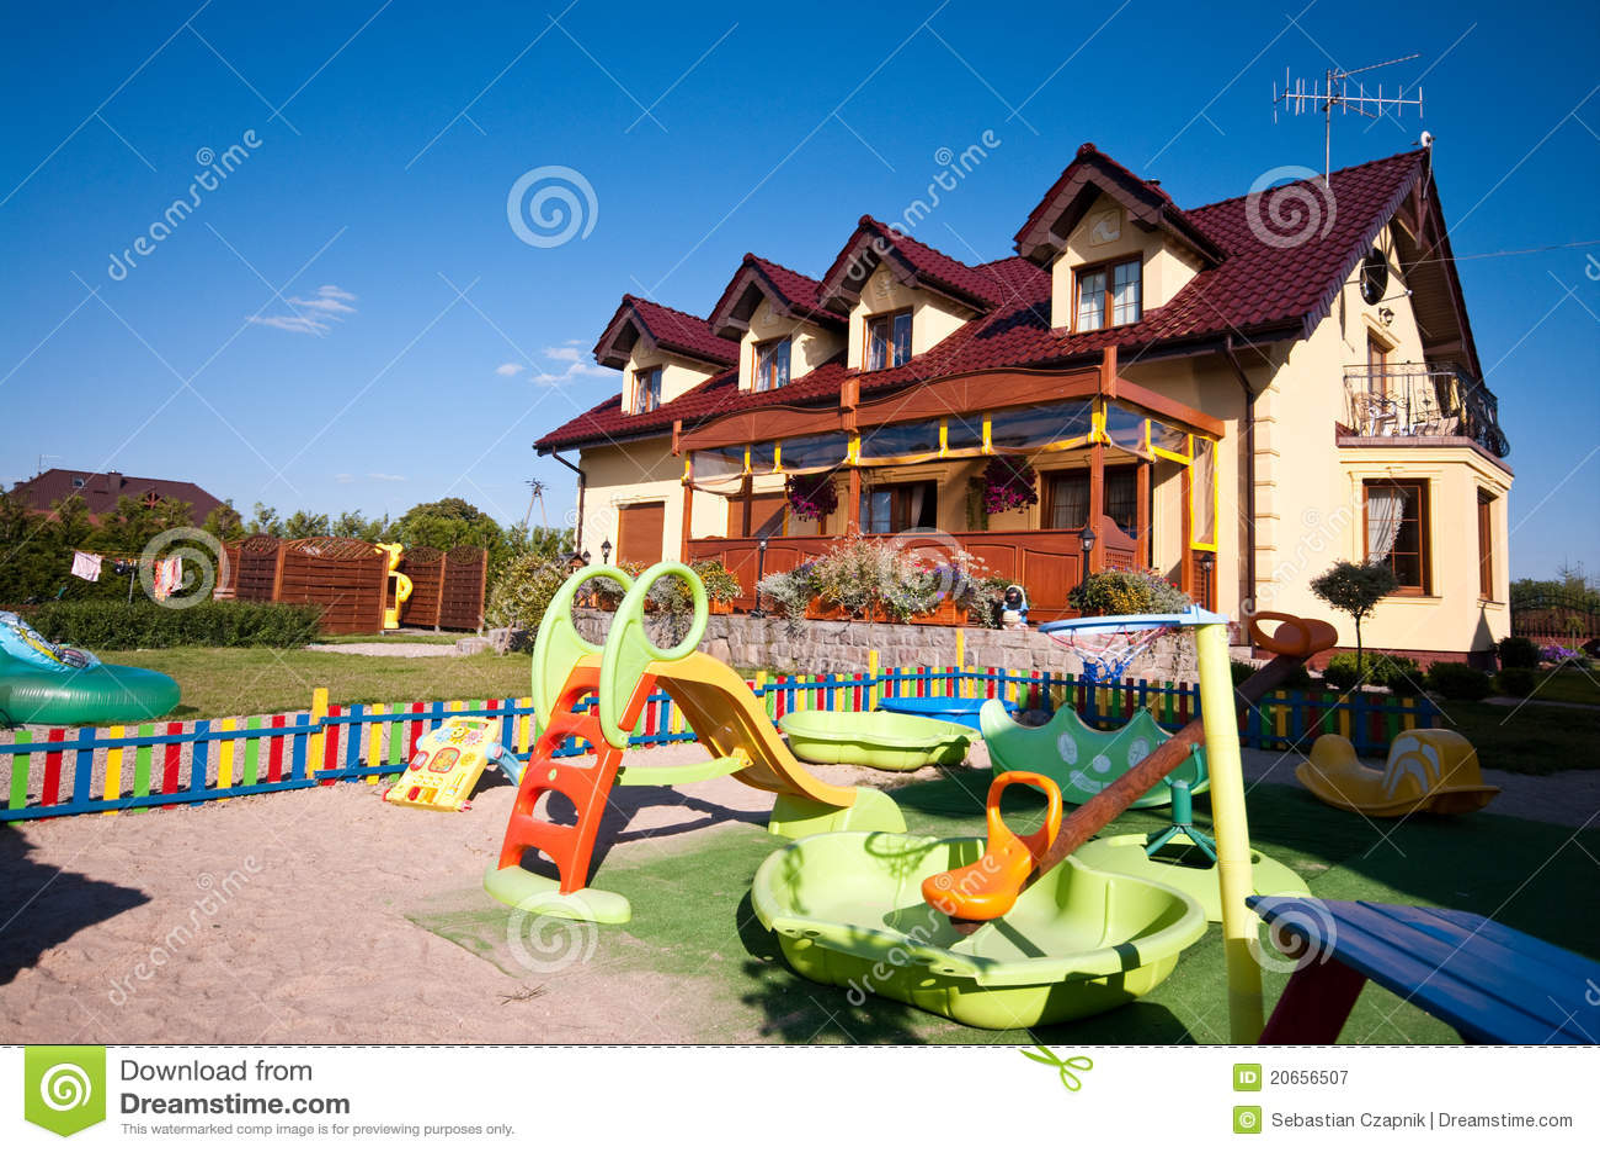 Casa juegos jardin good casita para guarderia parque for Guarderia tu jardin